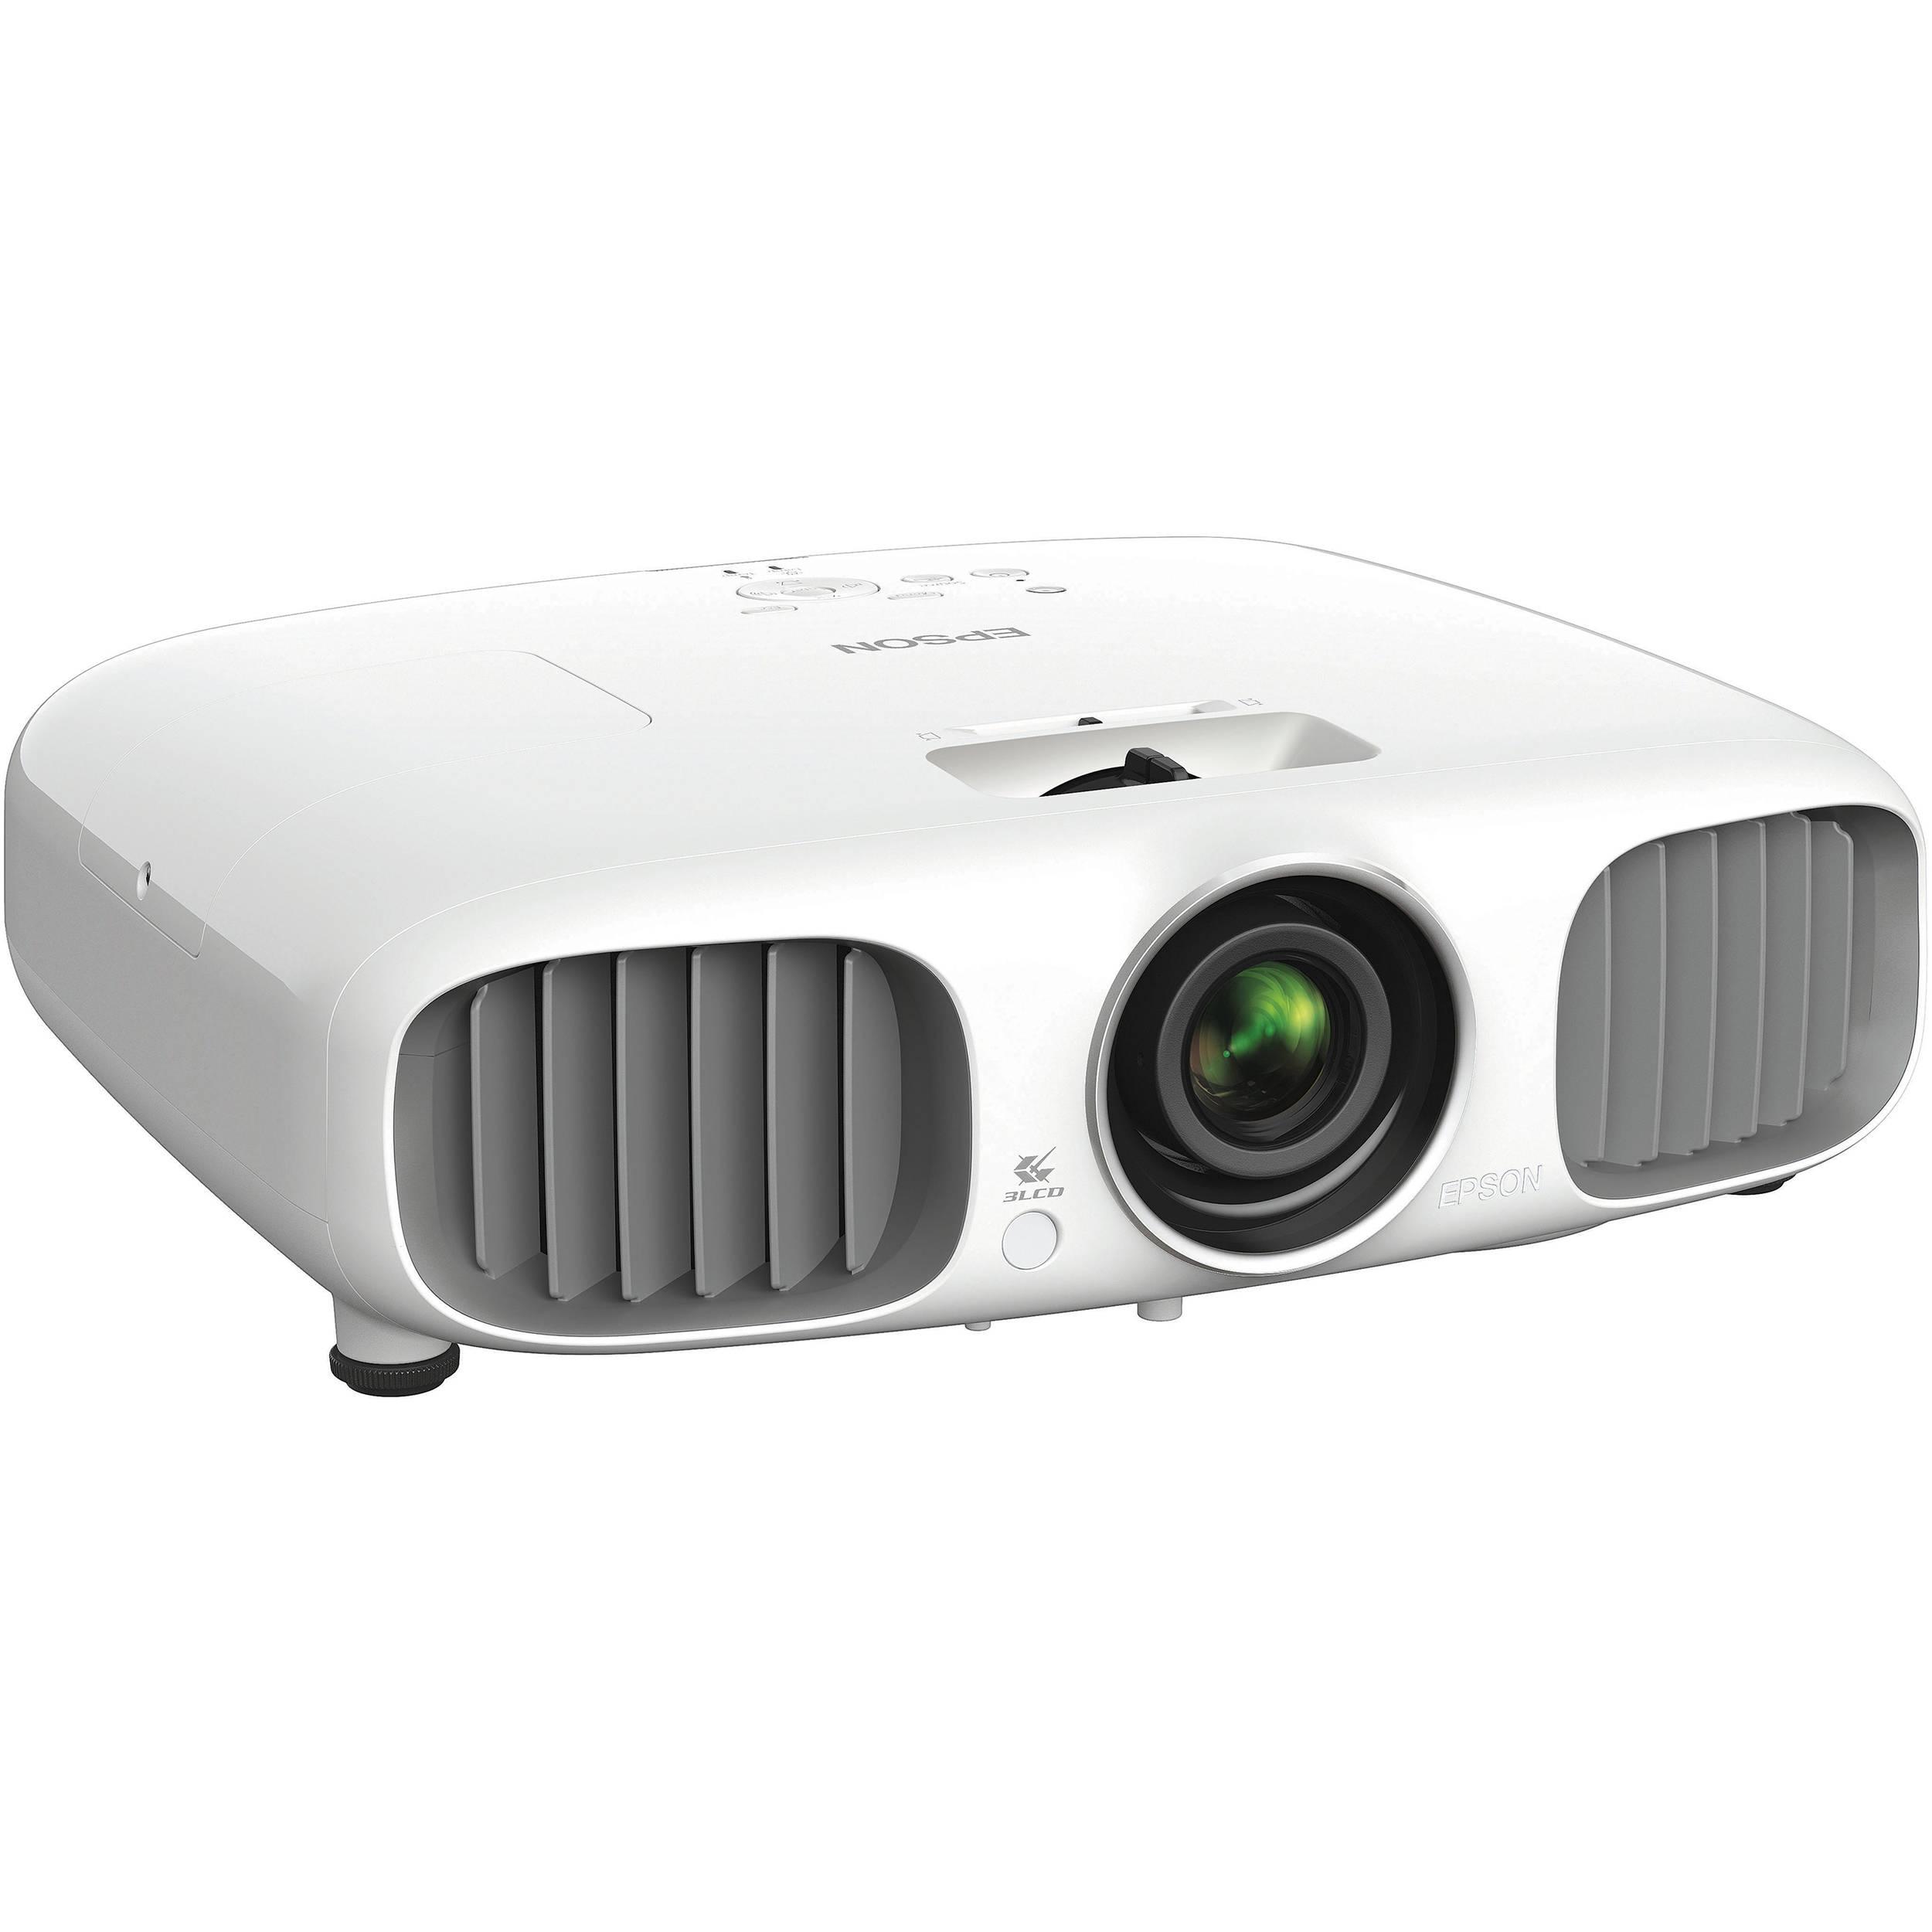 Epson Home Cinema 3020 Projector